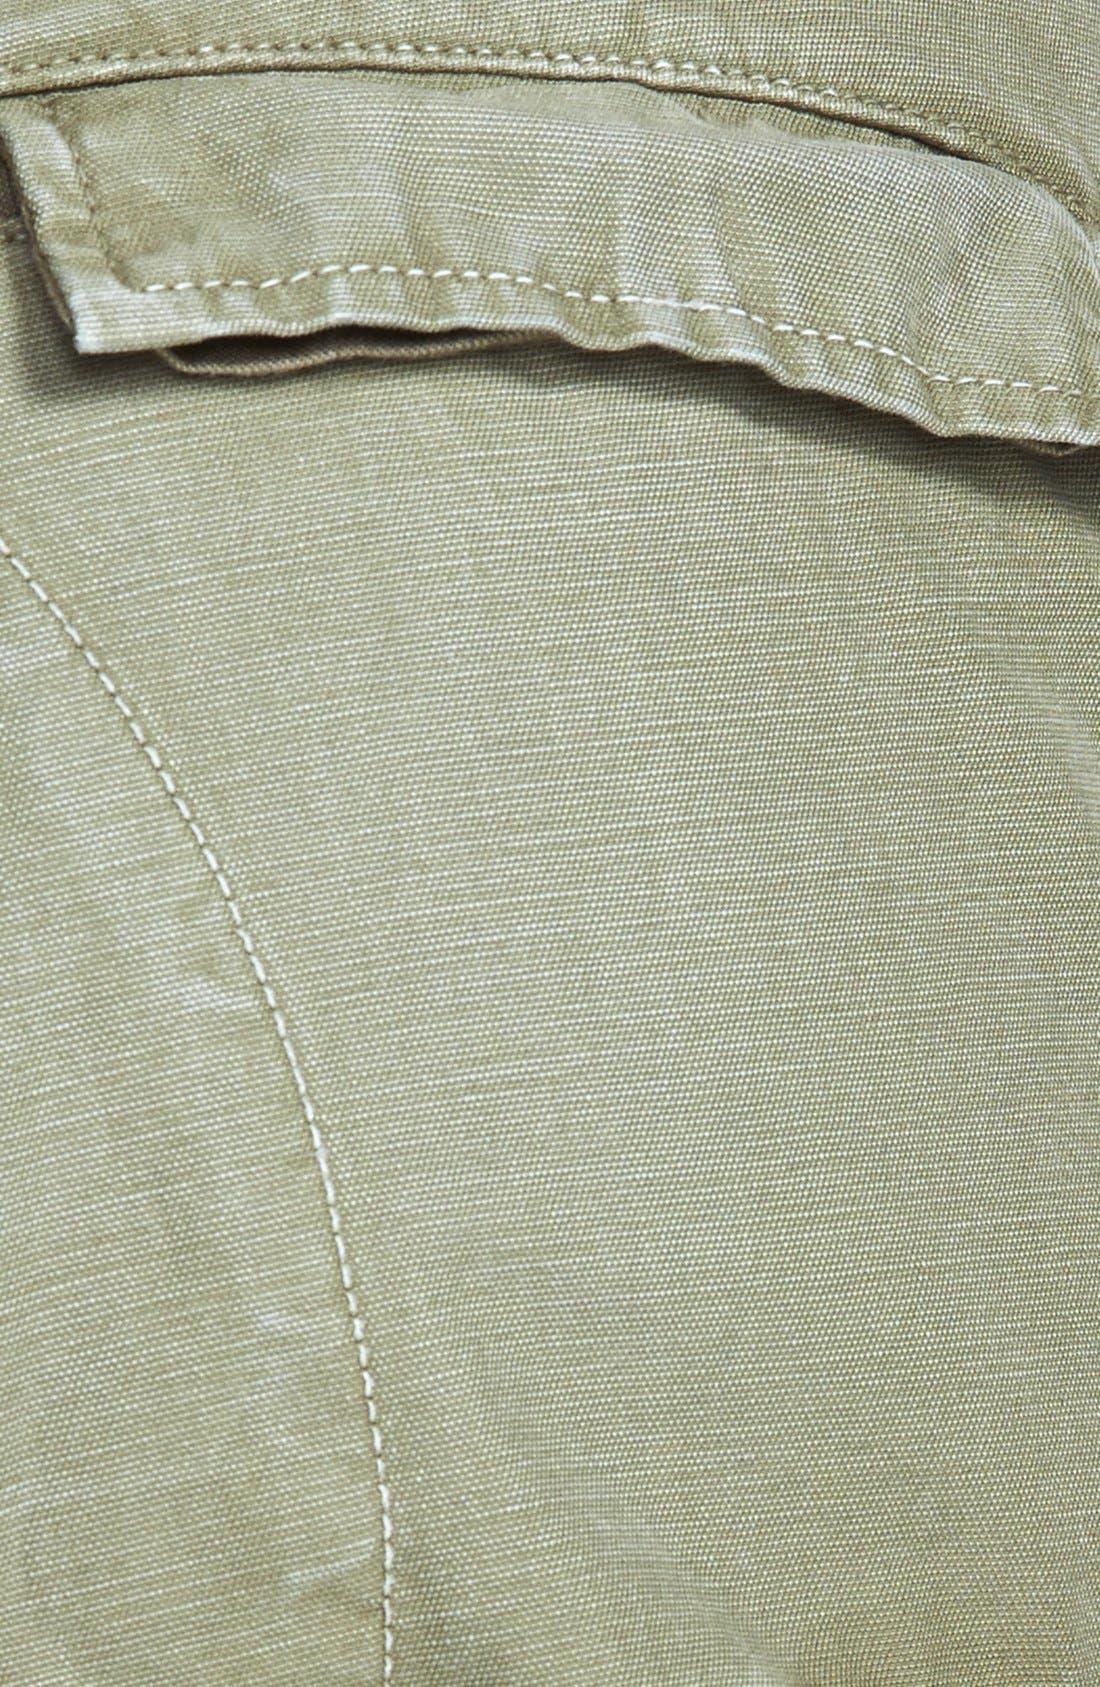 Alternate Image 3  - rag & bone/JEAN 'Combat' Cargo Pants